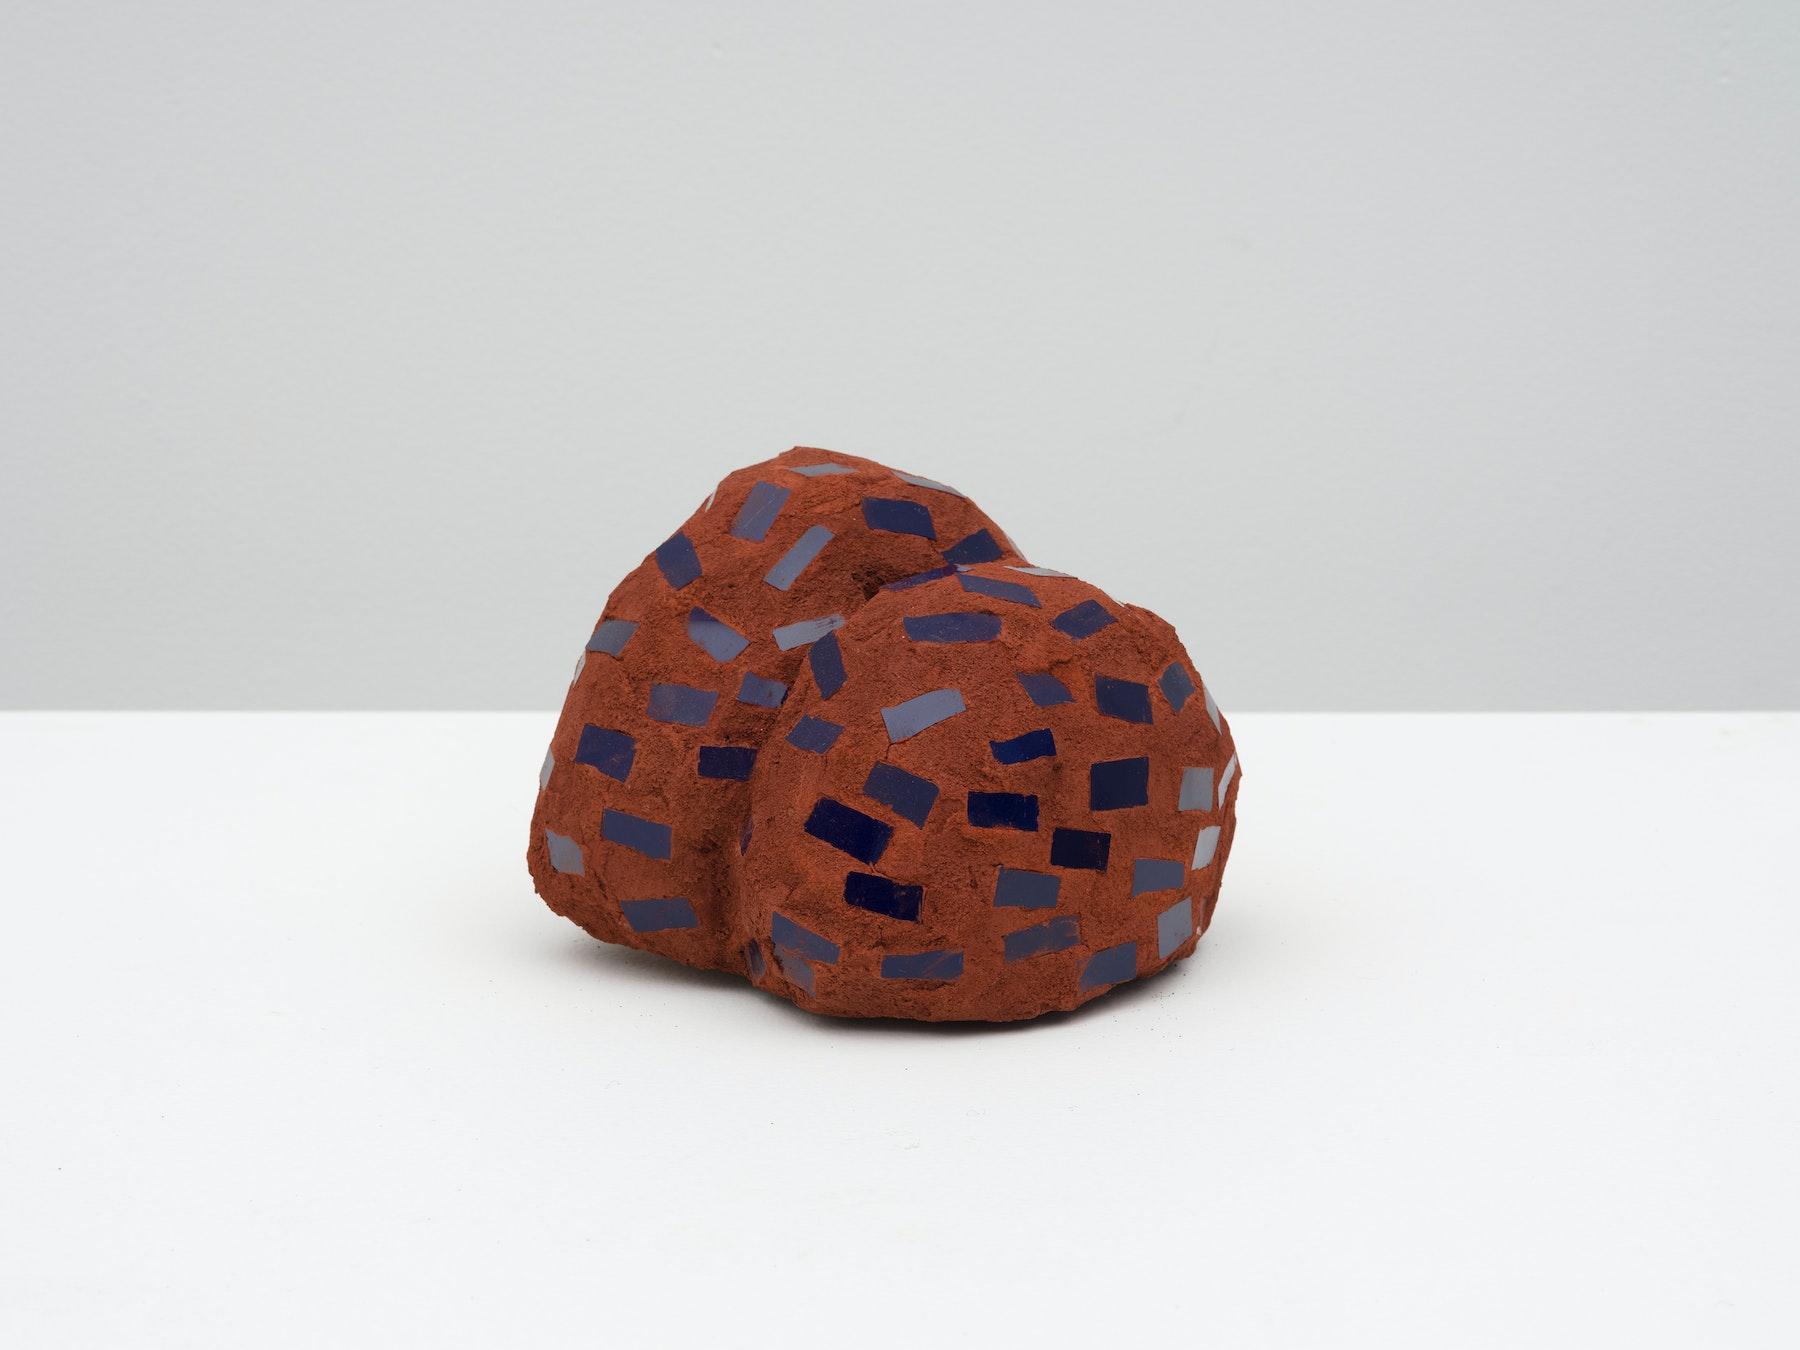 "Akina Cox ""Niki (Brown, Black),"" 2020 Glass, clay, grout, cement 4.5 x 5.25 x 5"" [HxWxD] (11.43 x 13.34 x 12.7 cm) Inventory #WS1045 Photo credit: Jeff Mclane"